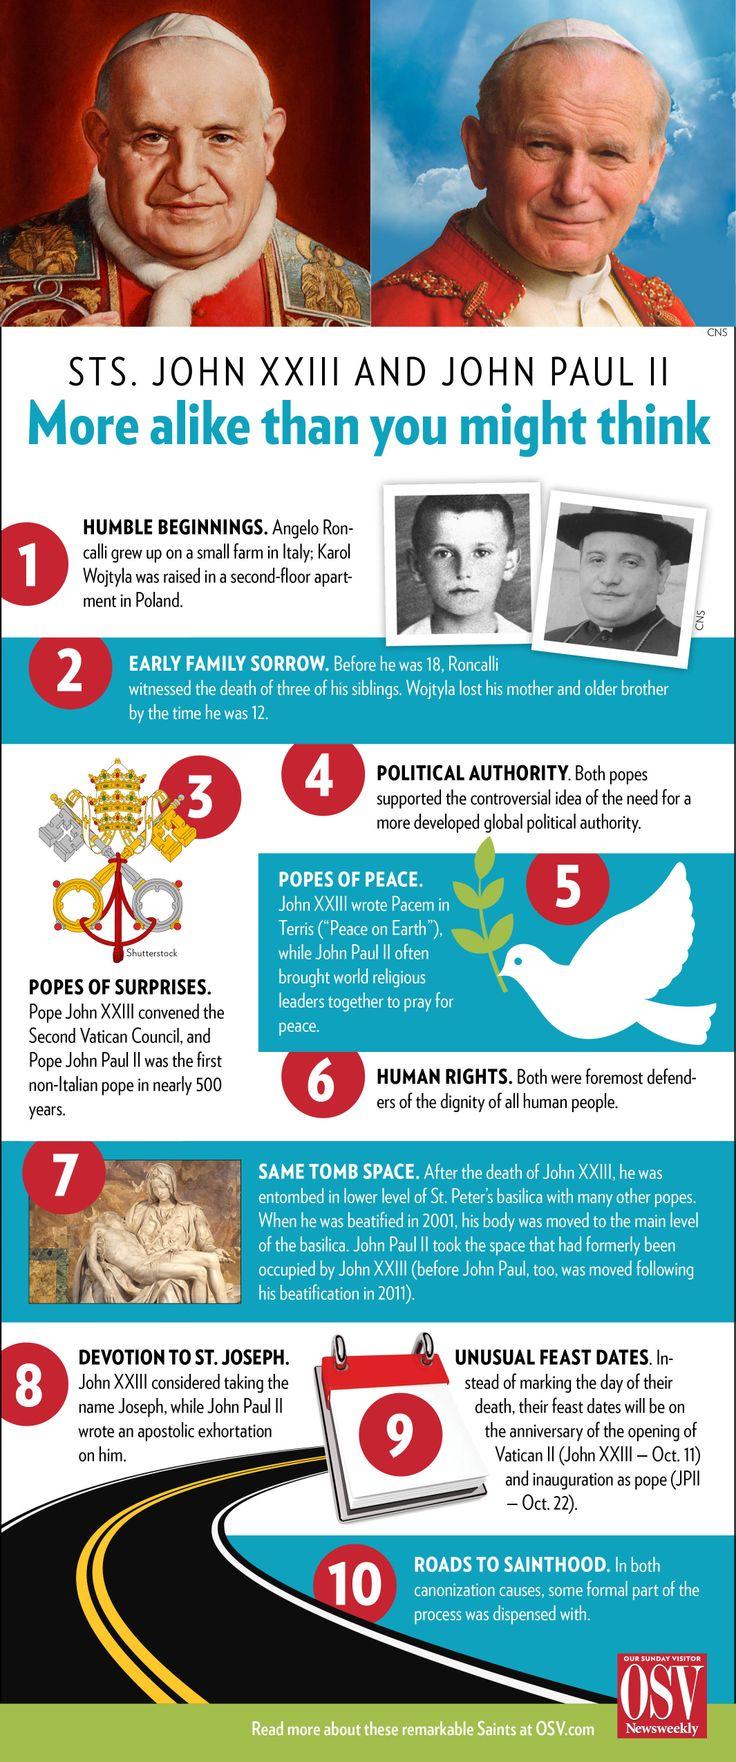 Pope John XXIII and Pope John Paul II -- They're more alike than you think!